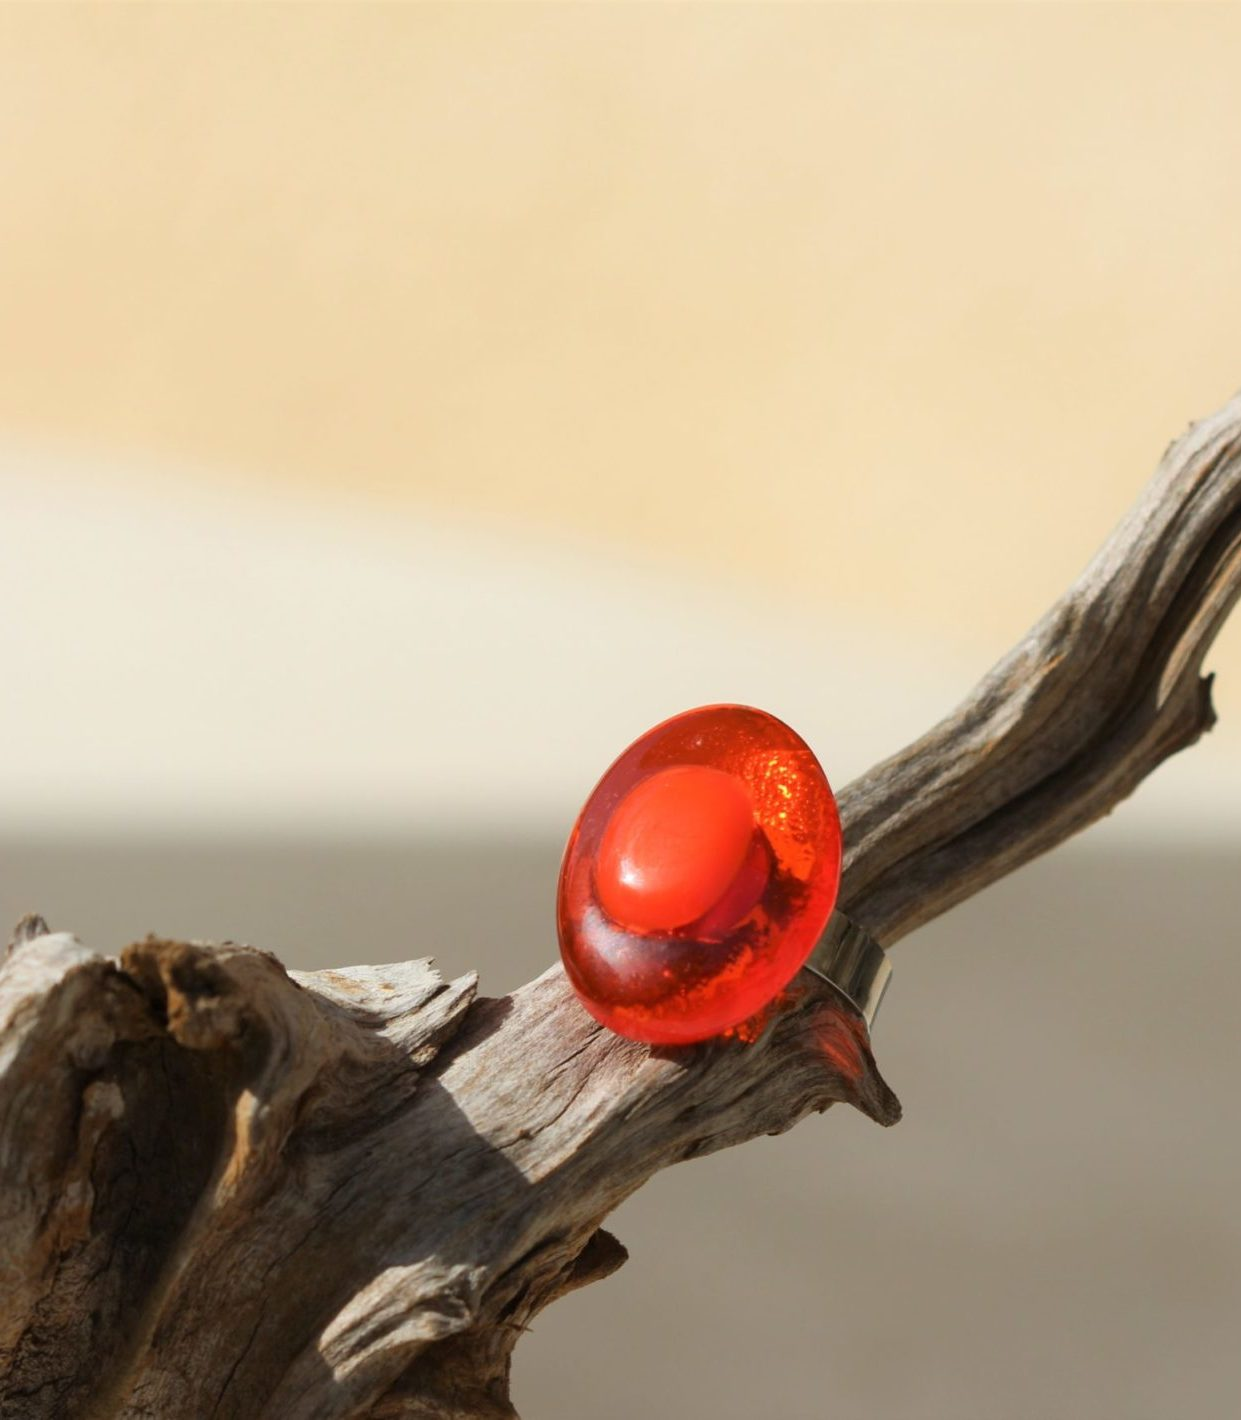 bague en verre orange ovale